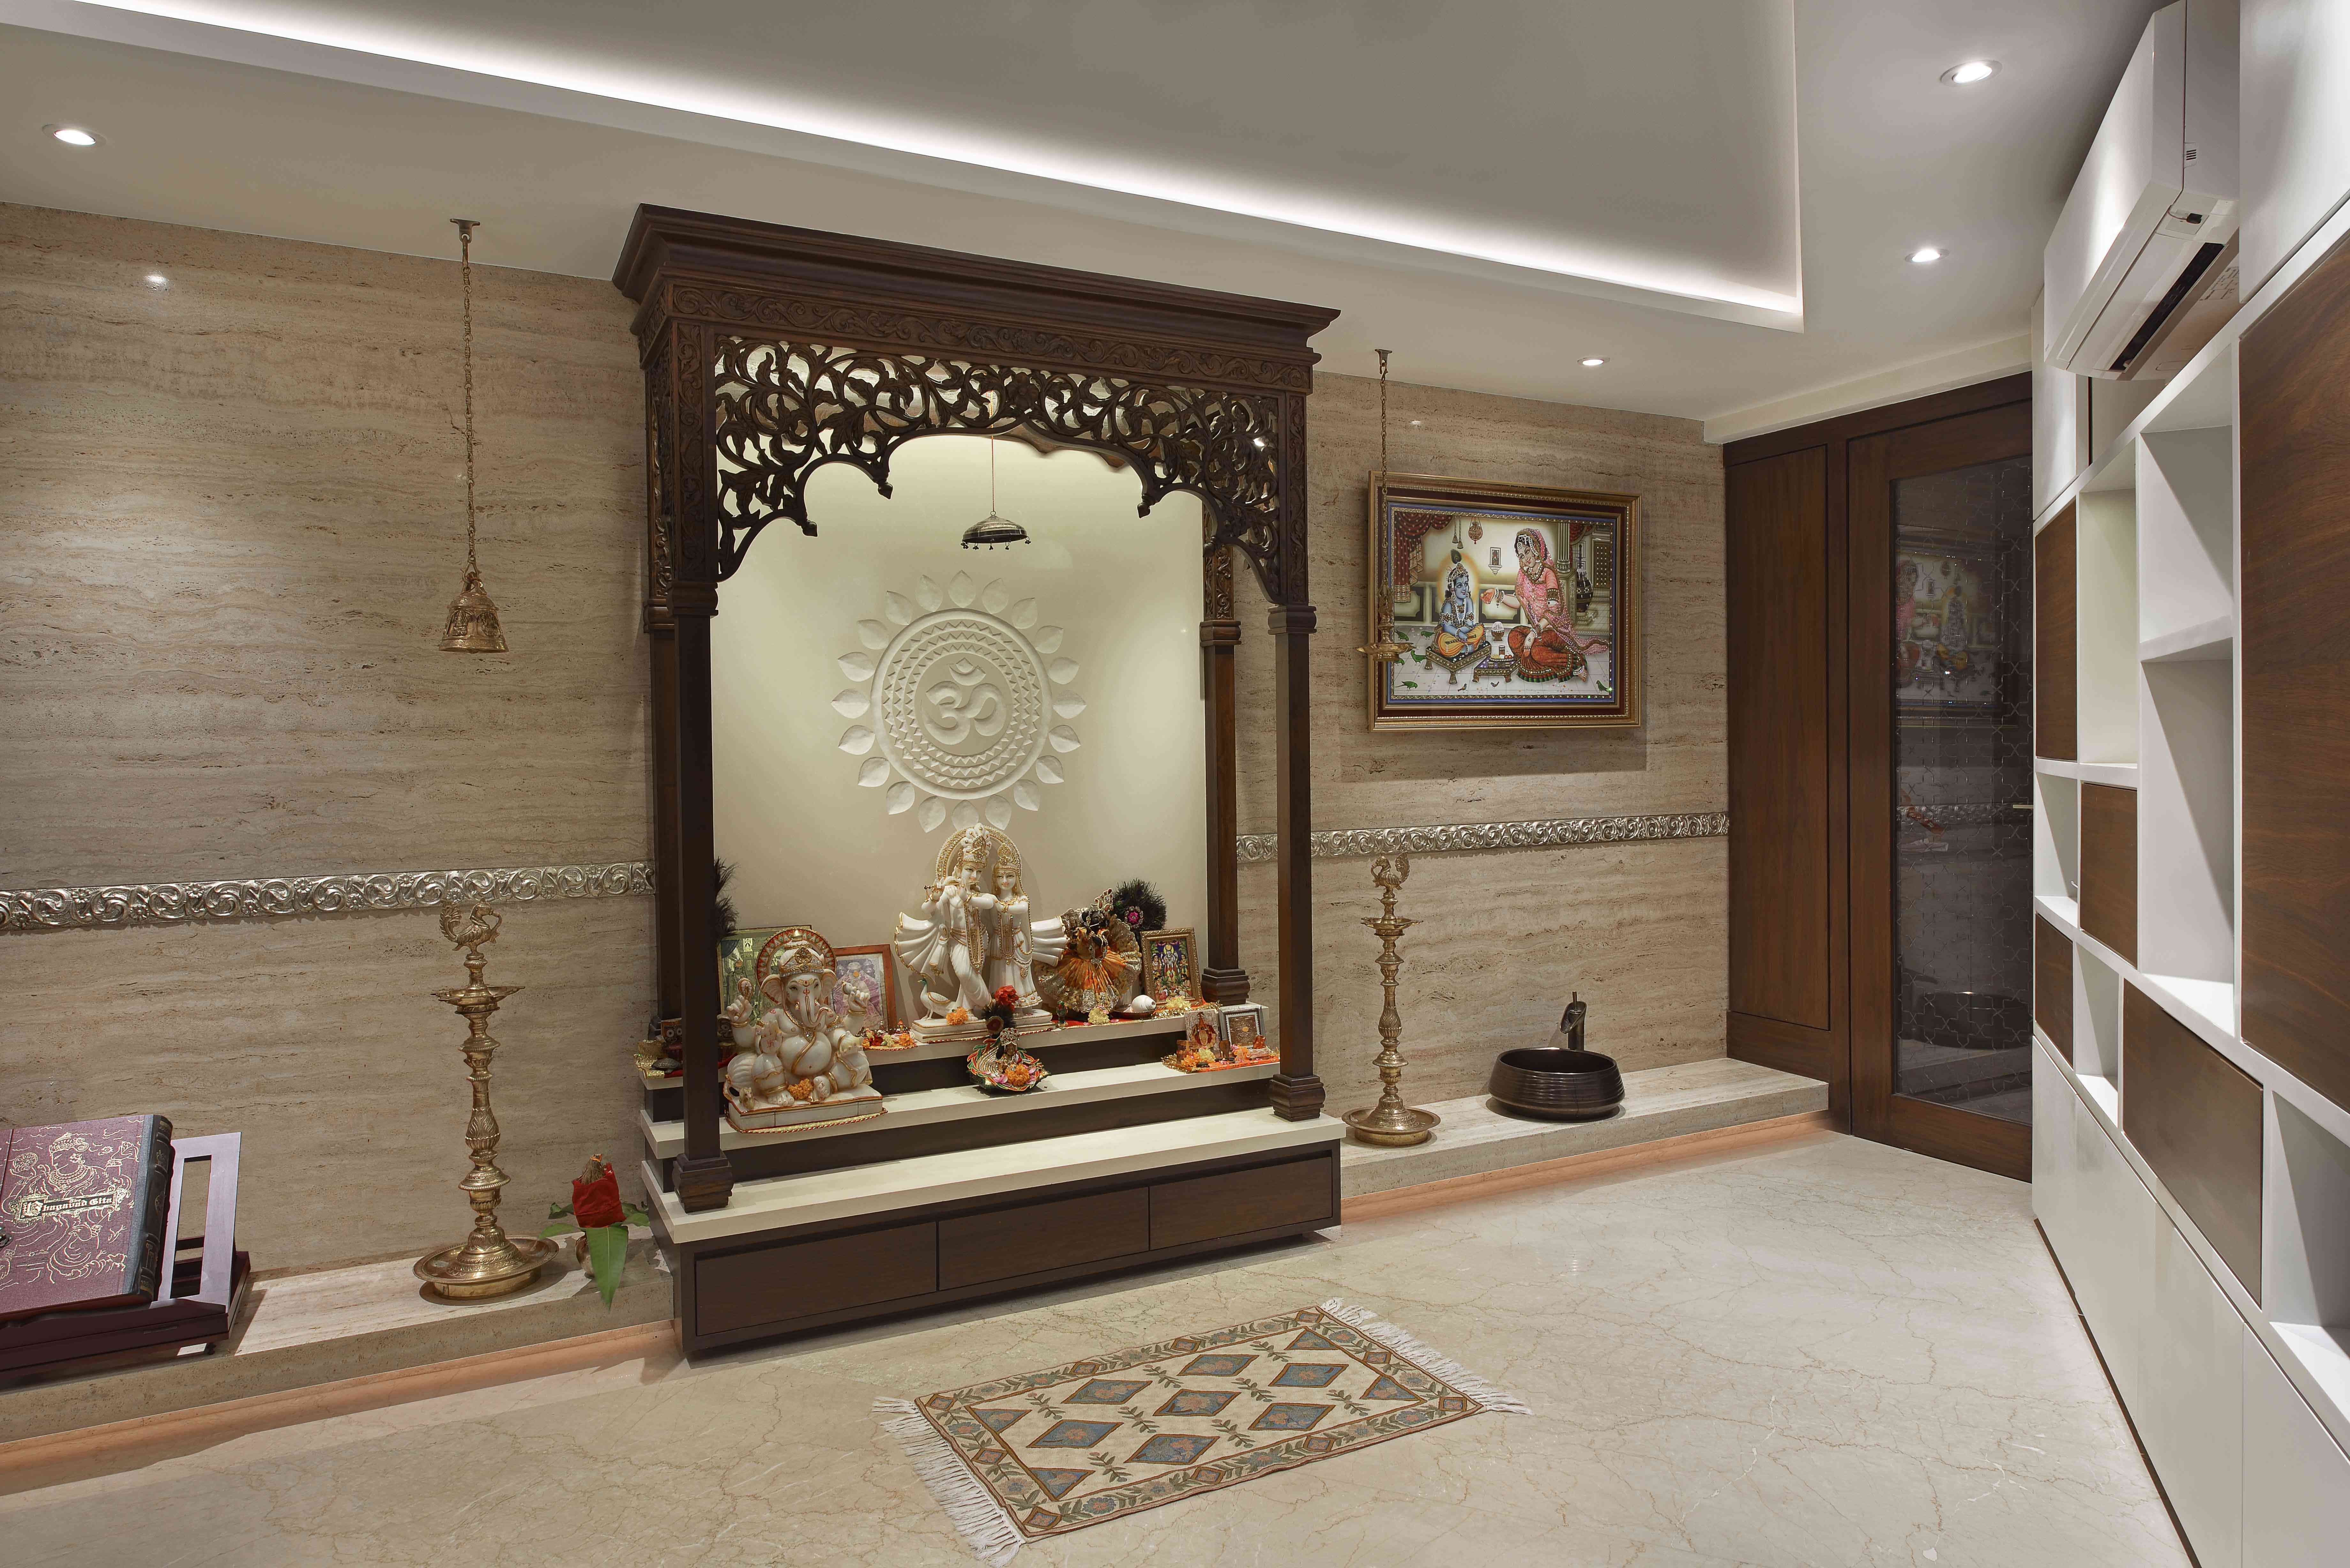 mandir in living room | www.myfamilyliving.com